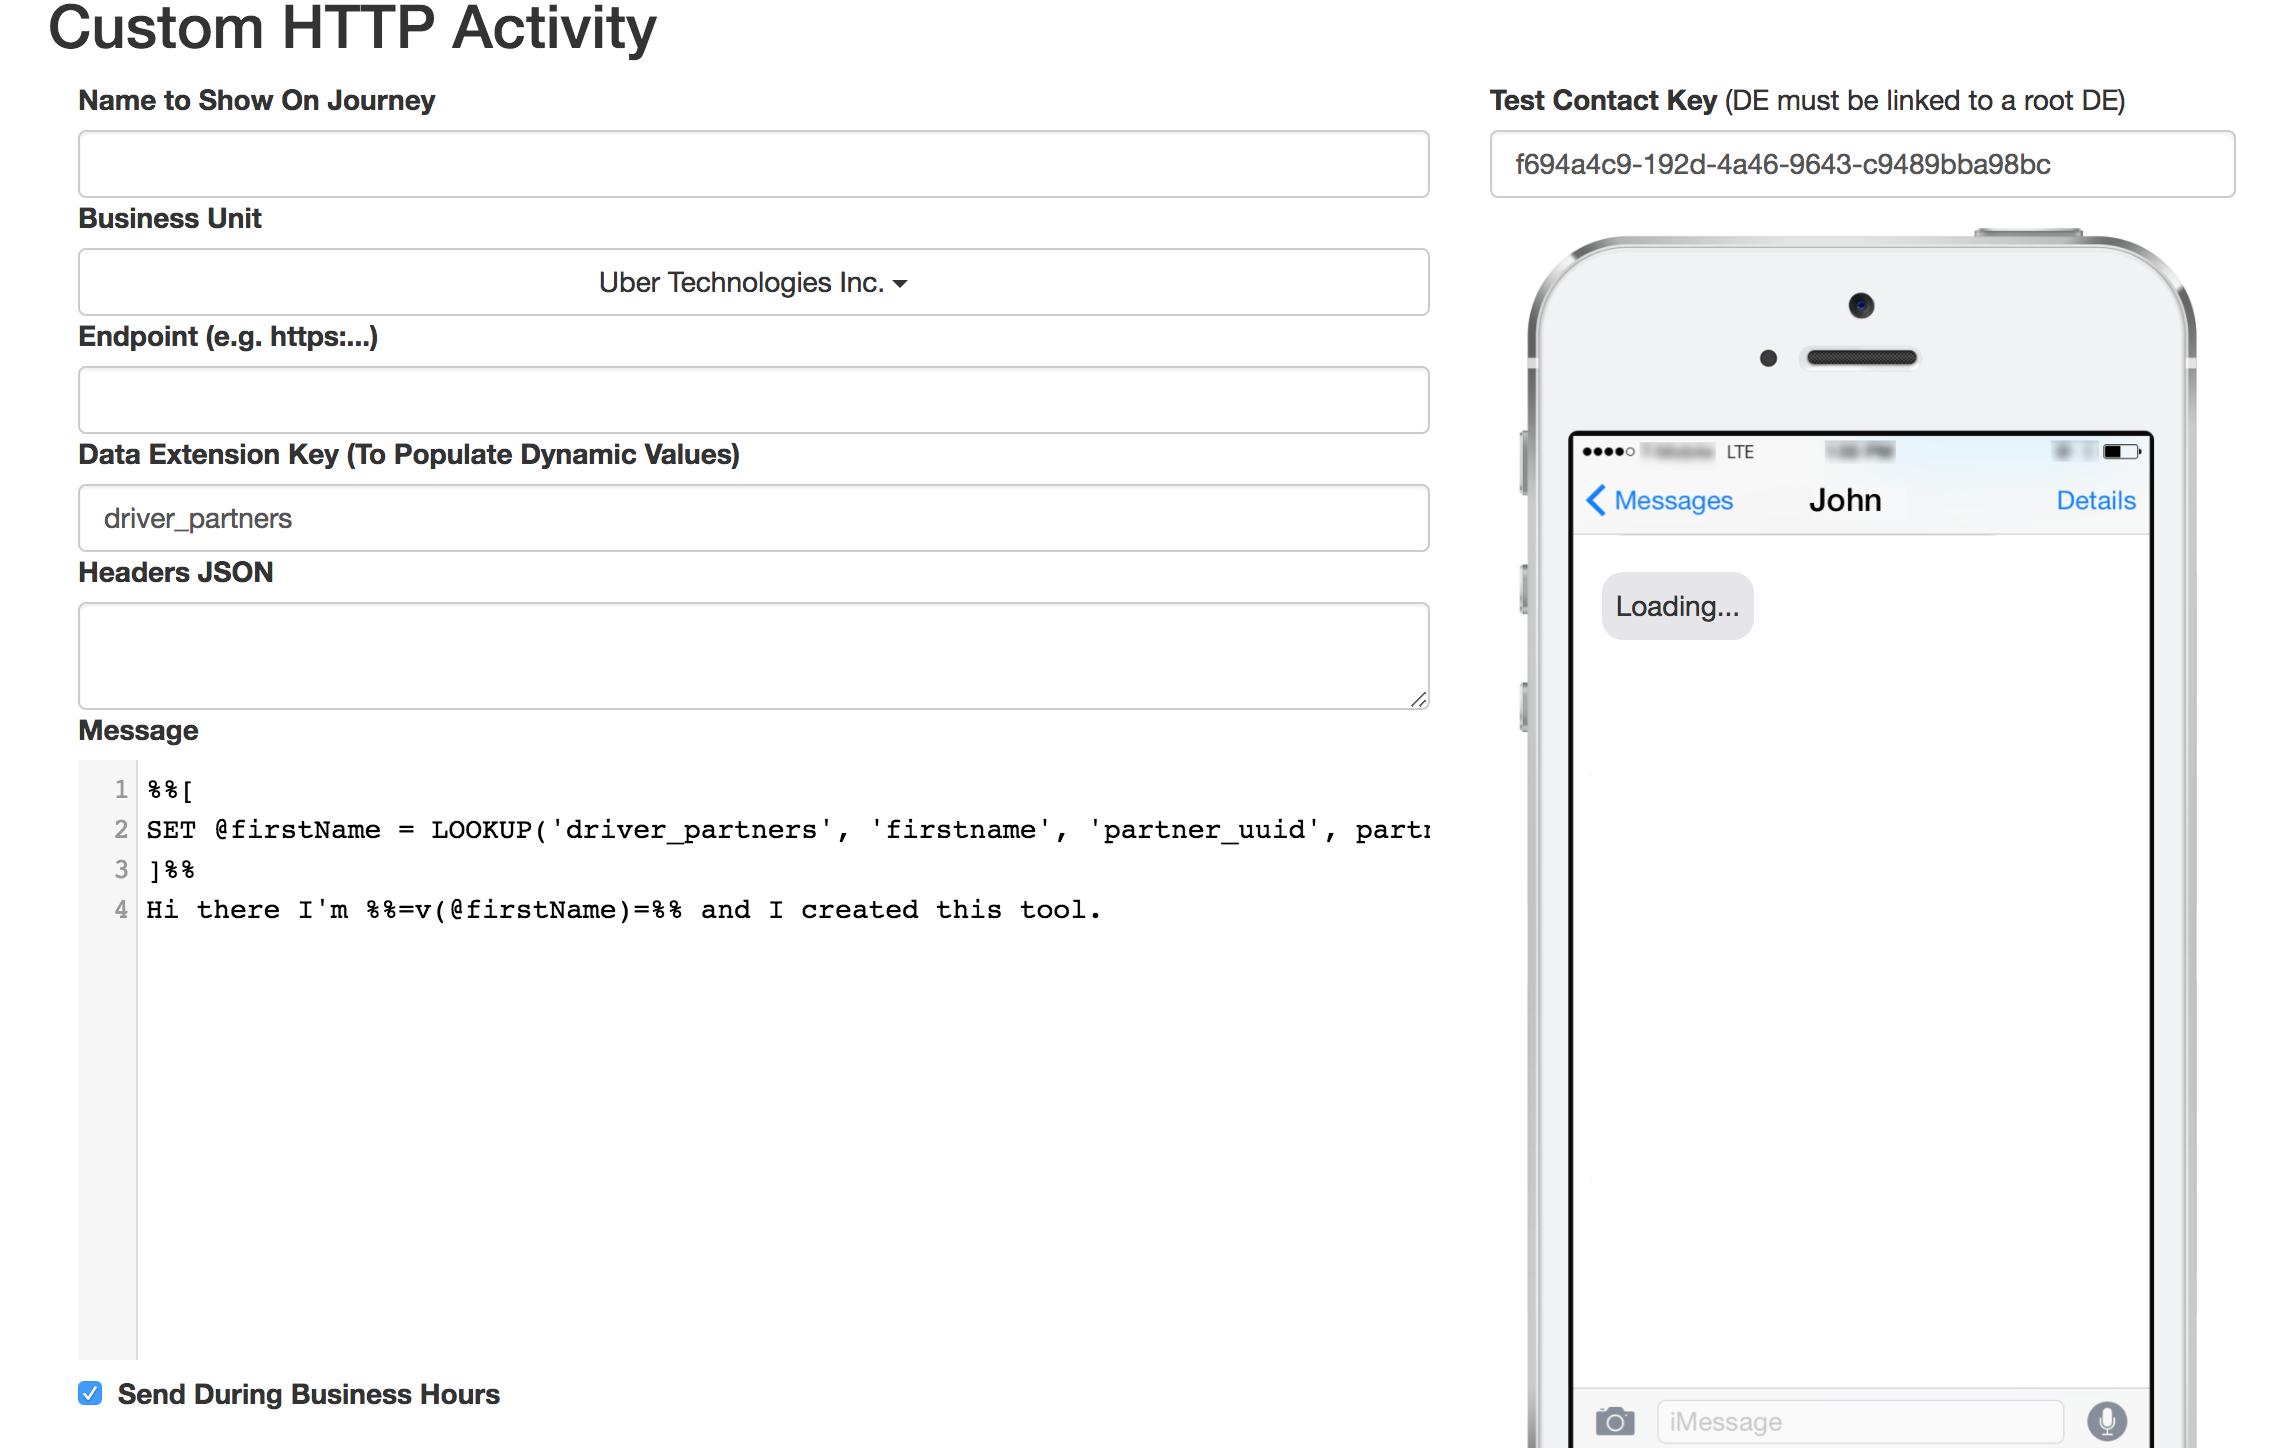 Gaining access to Uber's user data through AMPScript